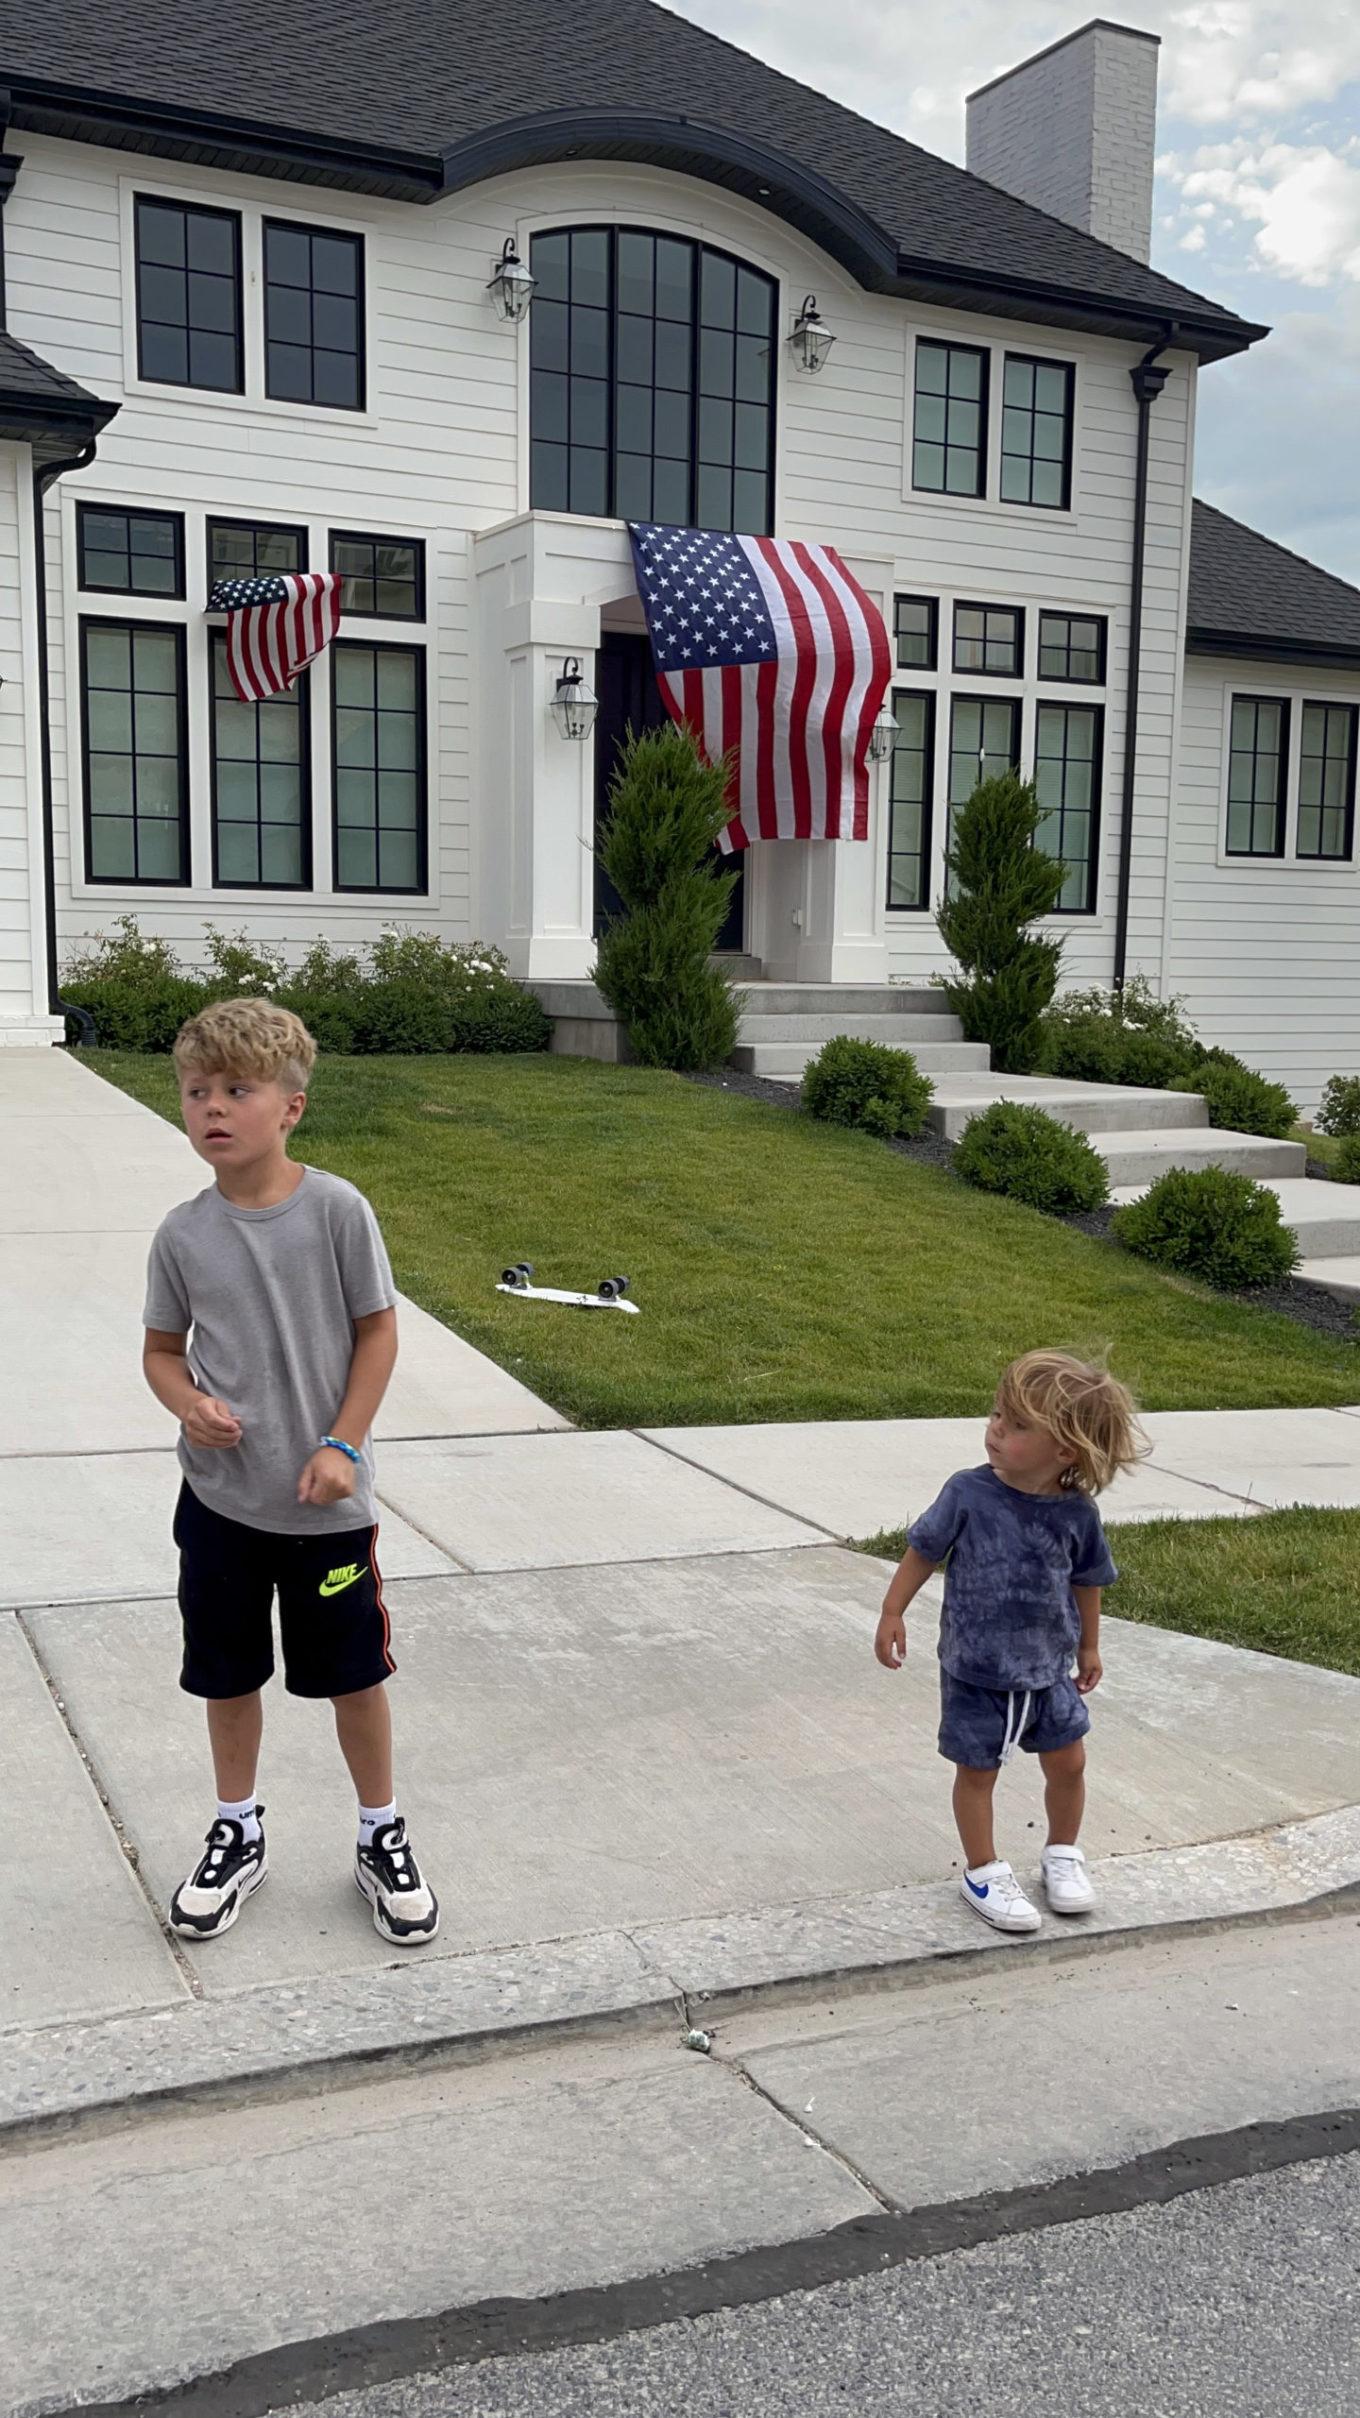 July best-seller, tie dye toddler set